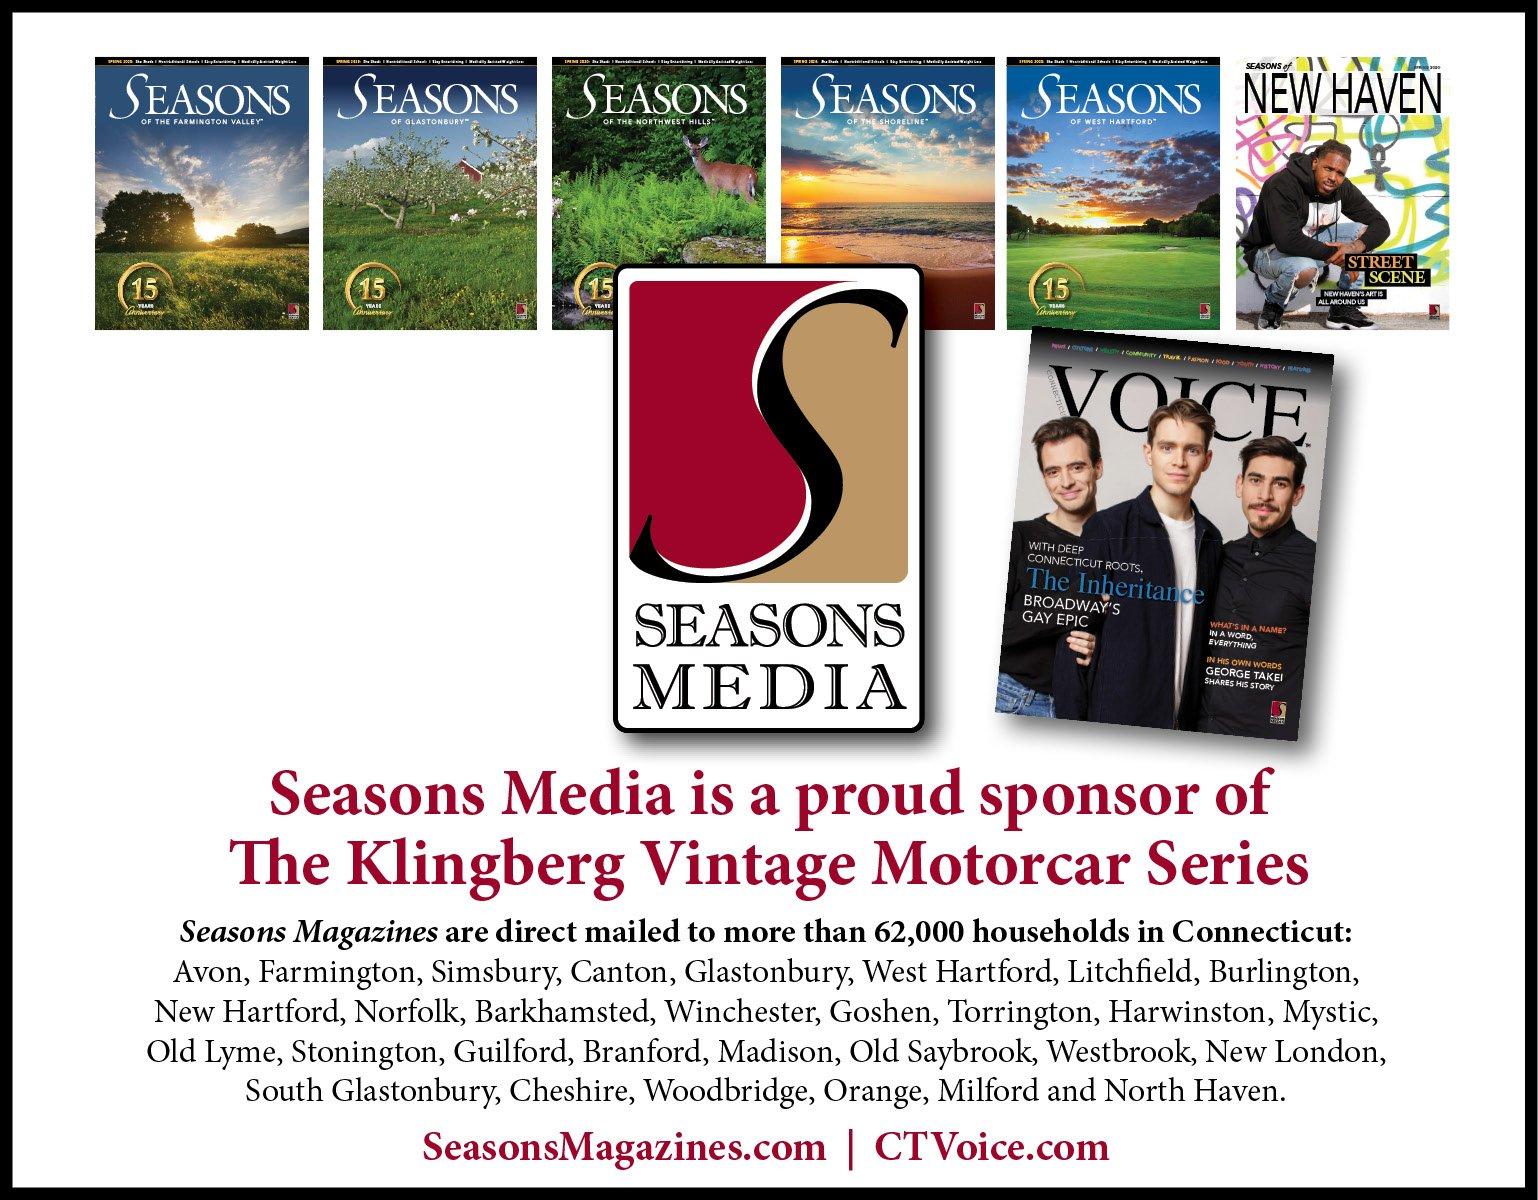 Seasons Media